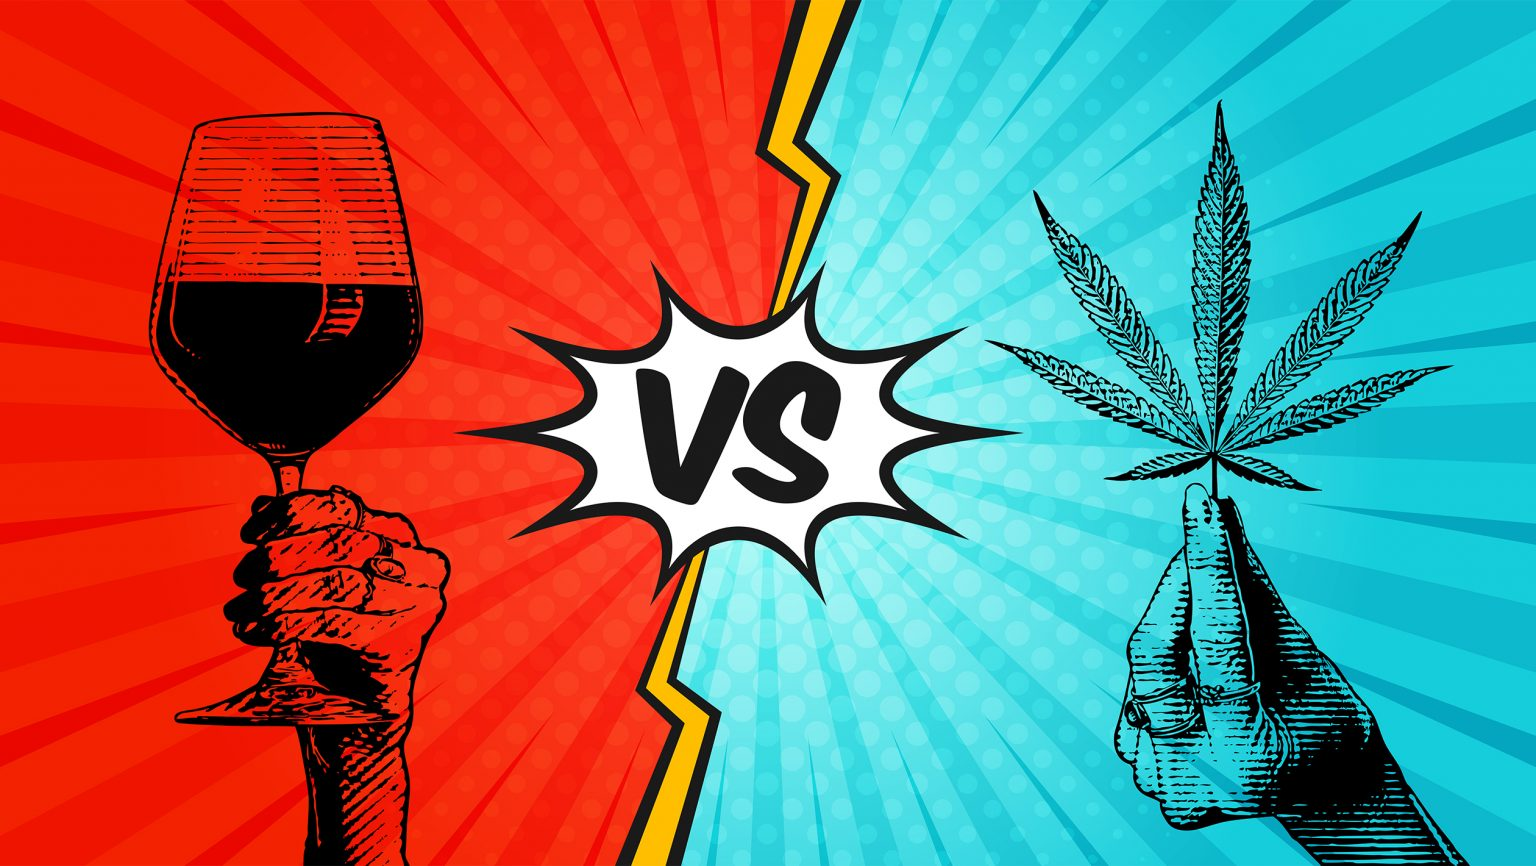 SFD_Cannabis-Industry-vs.-Wine-Industry_Hero_CR_Larry-Lee_CO_iStock_2520x1420-1536x866